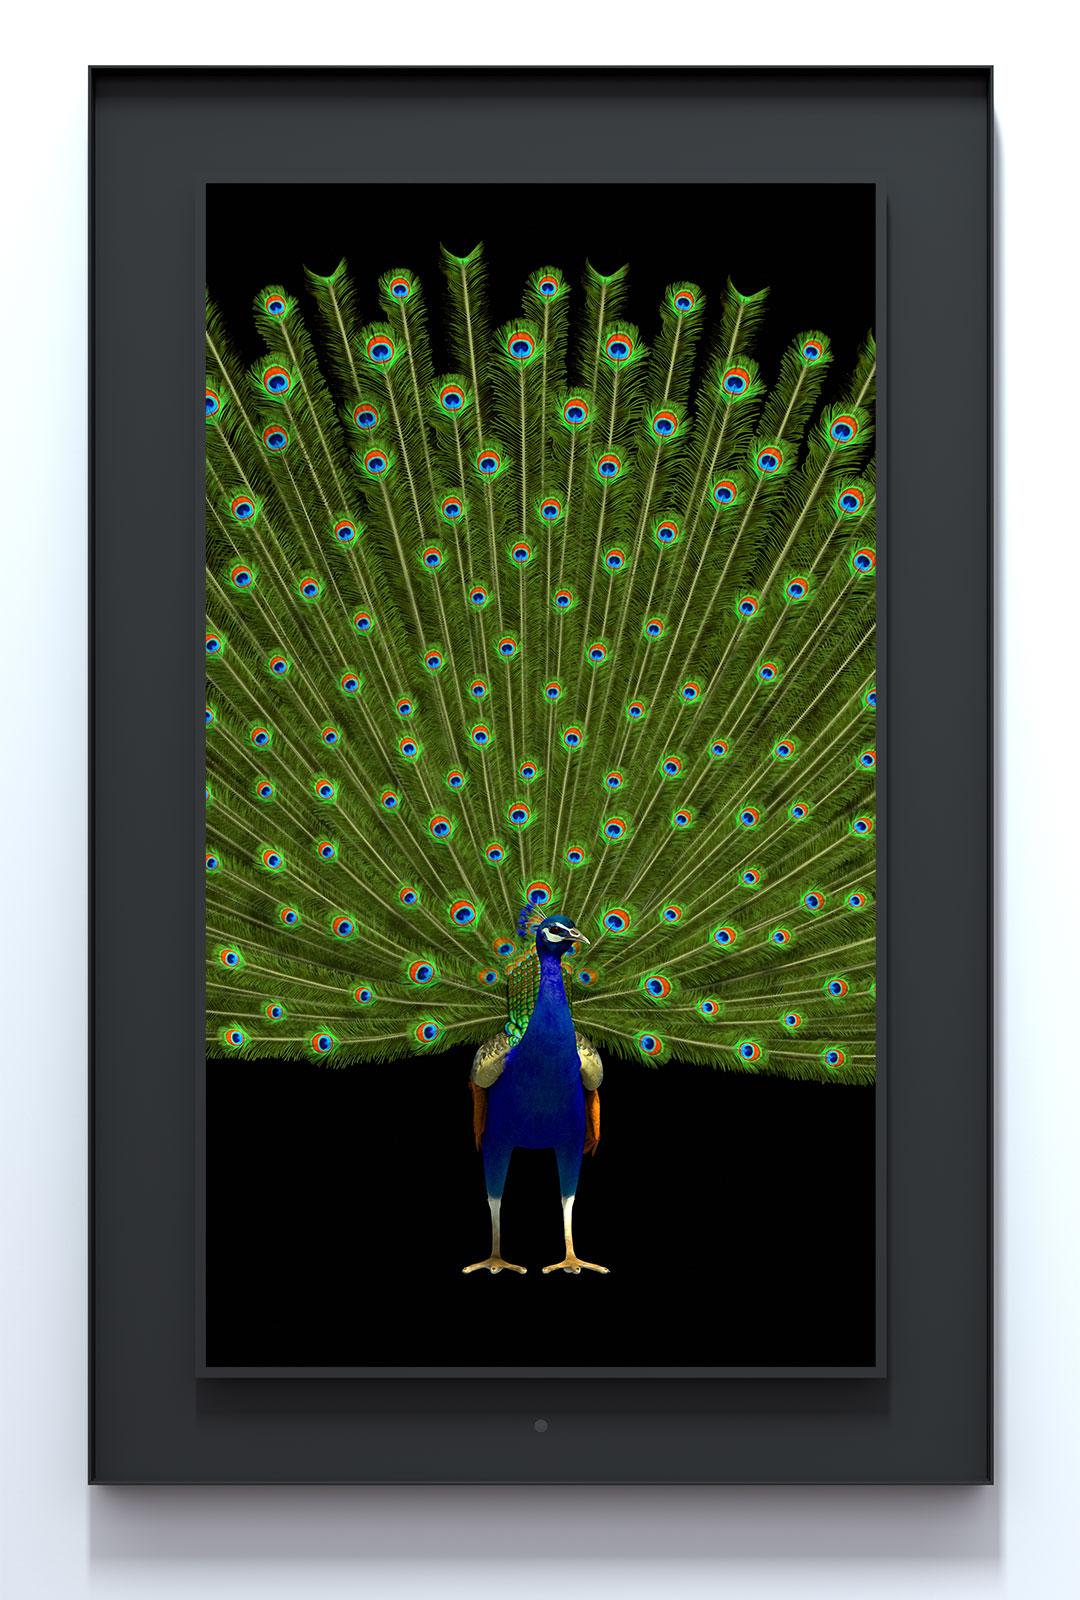 Ruffled: Indian Peafowl